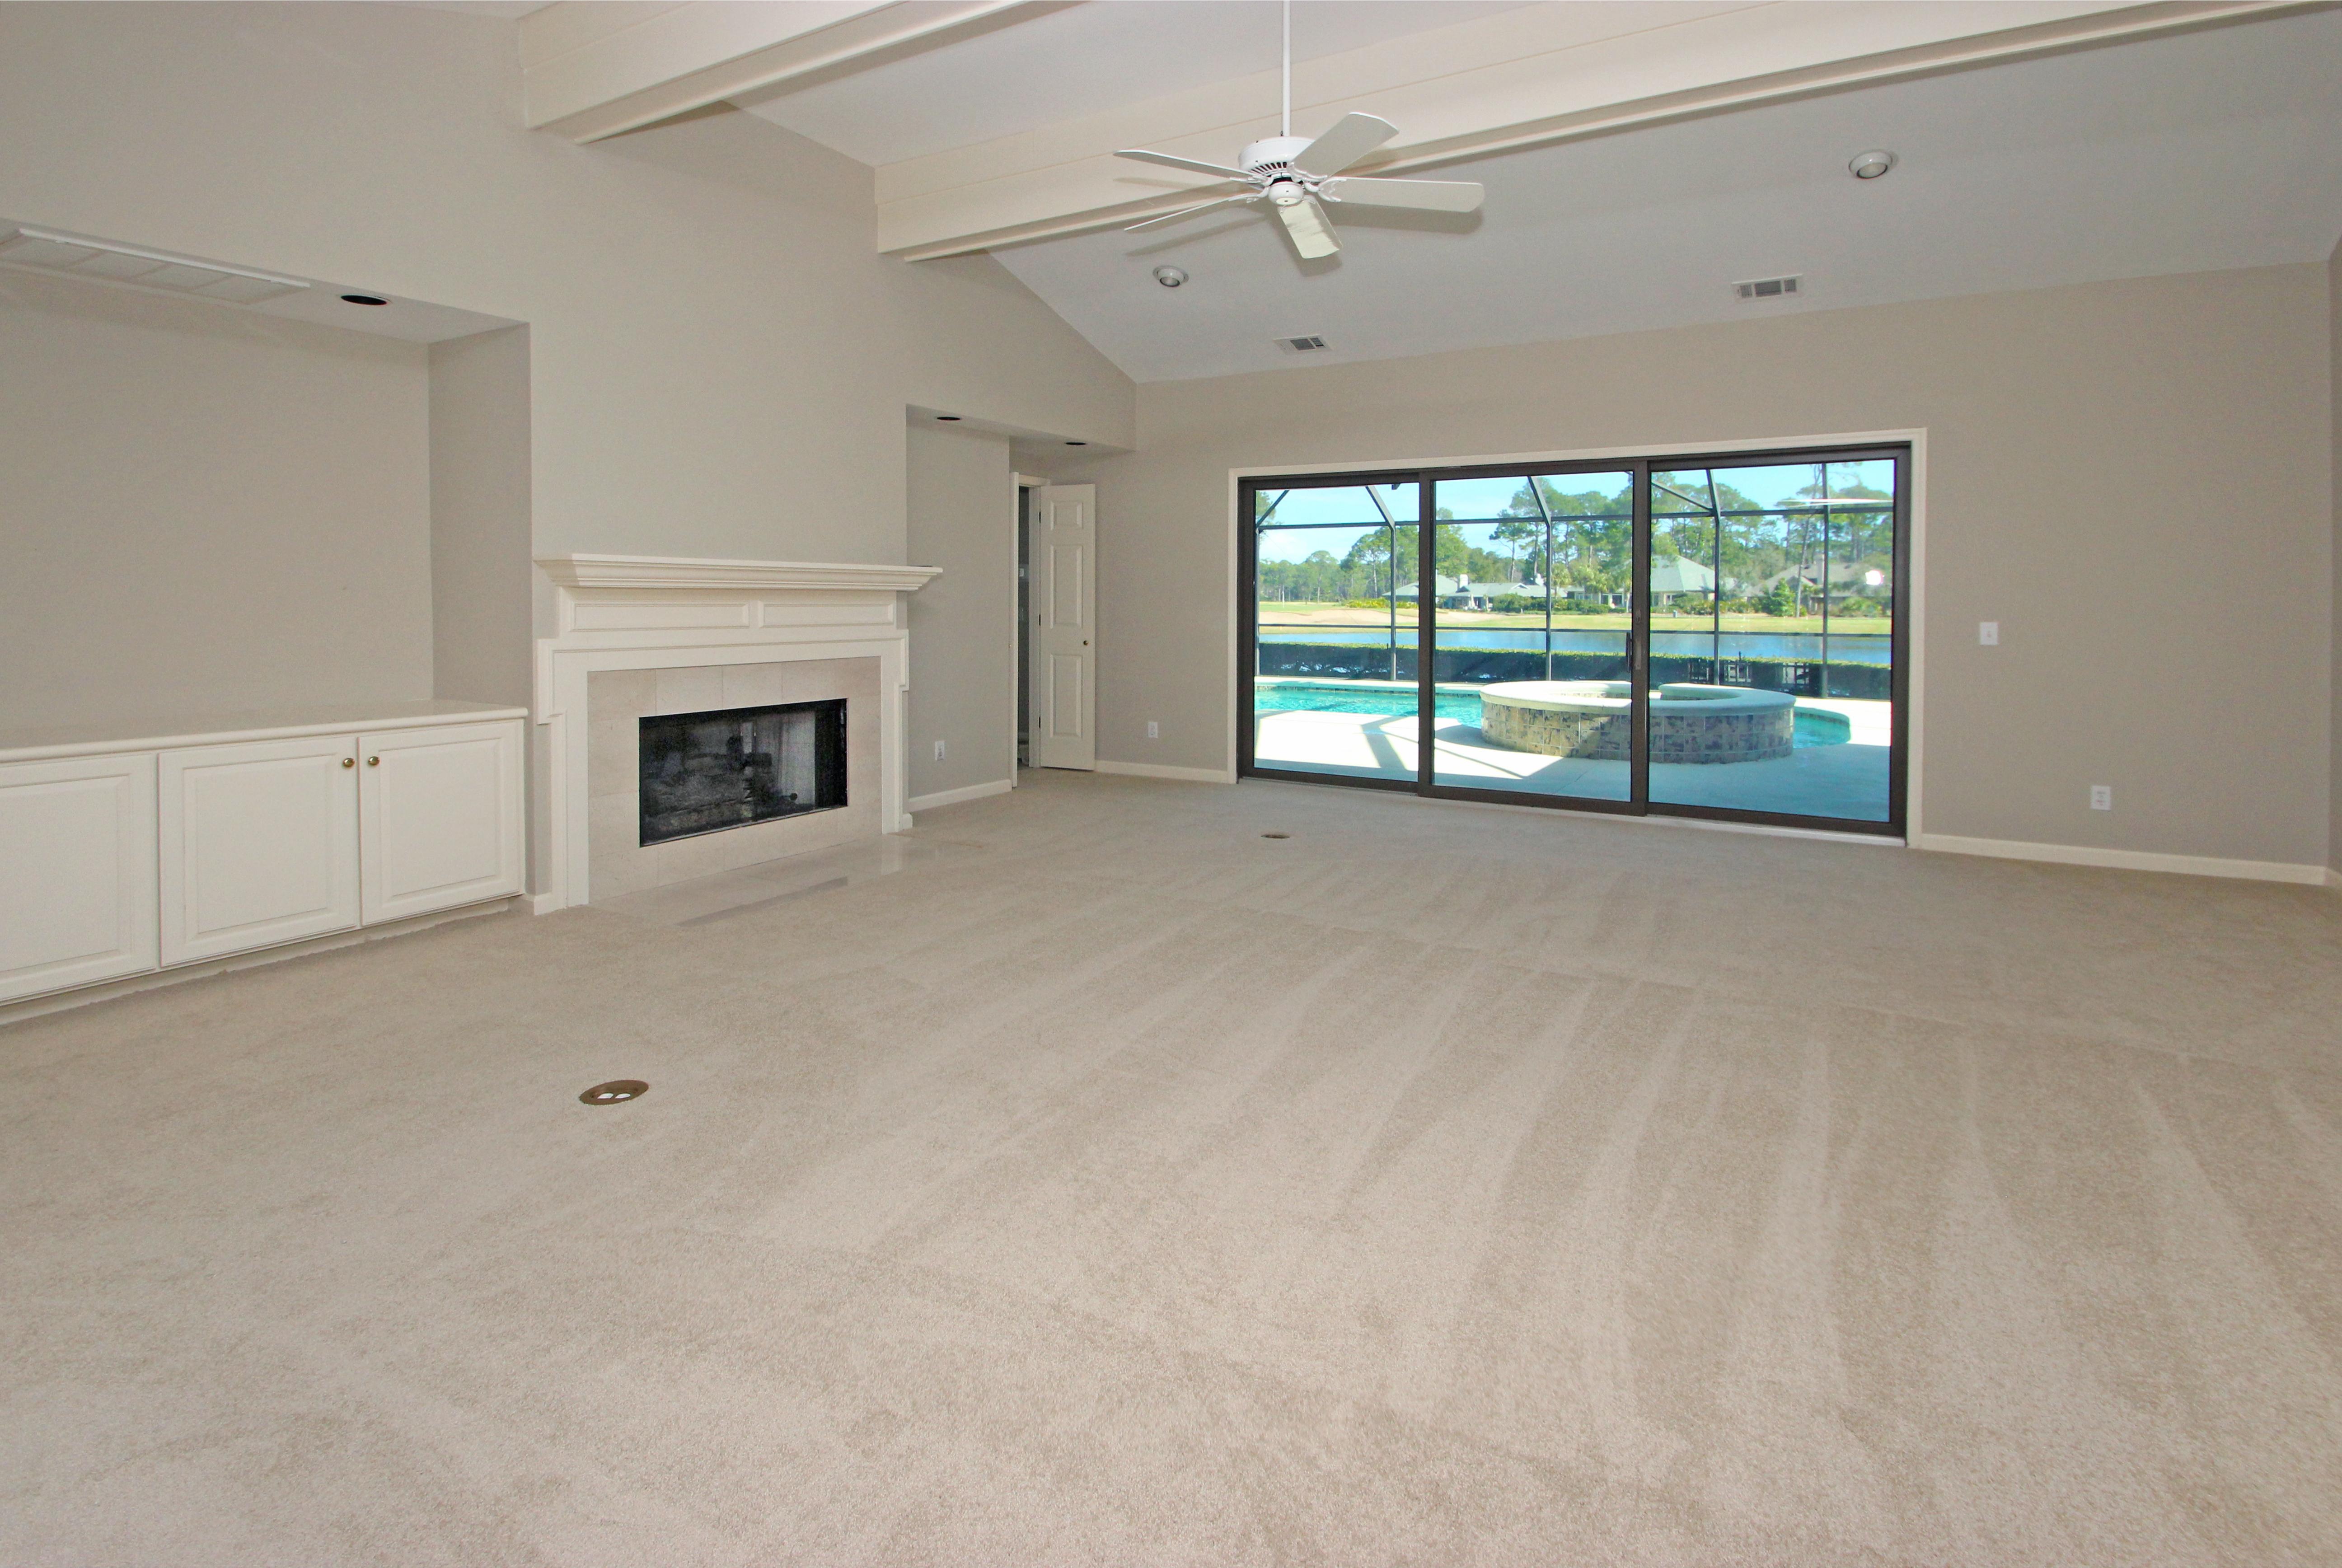 HI - Living room